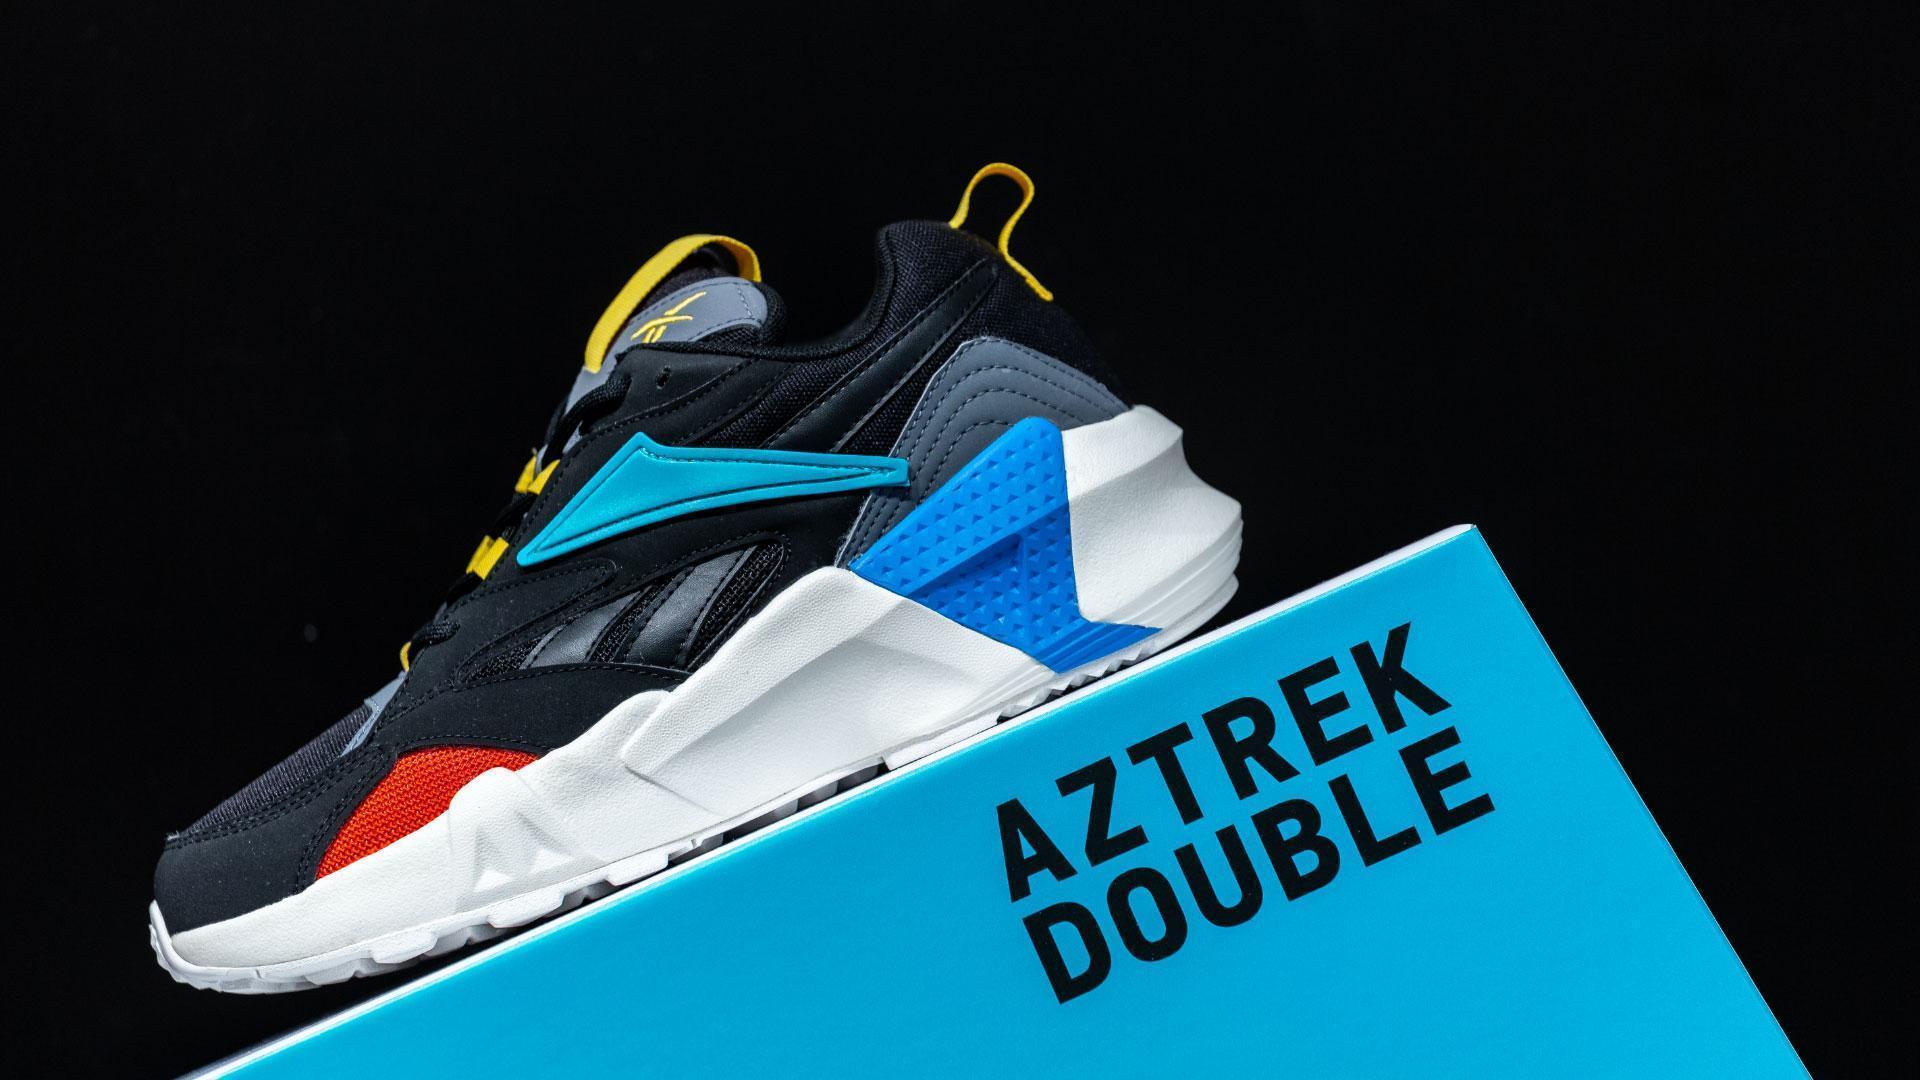 Reebok Aztrek Double